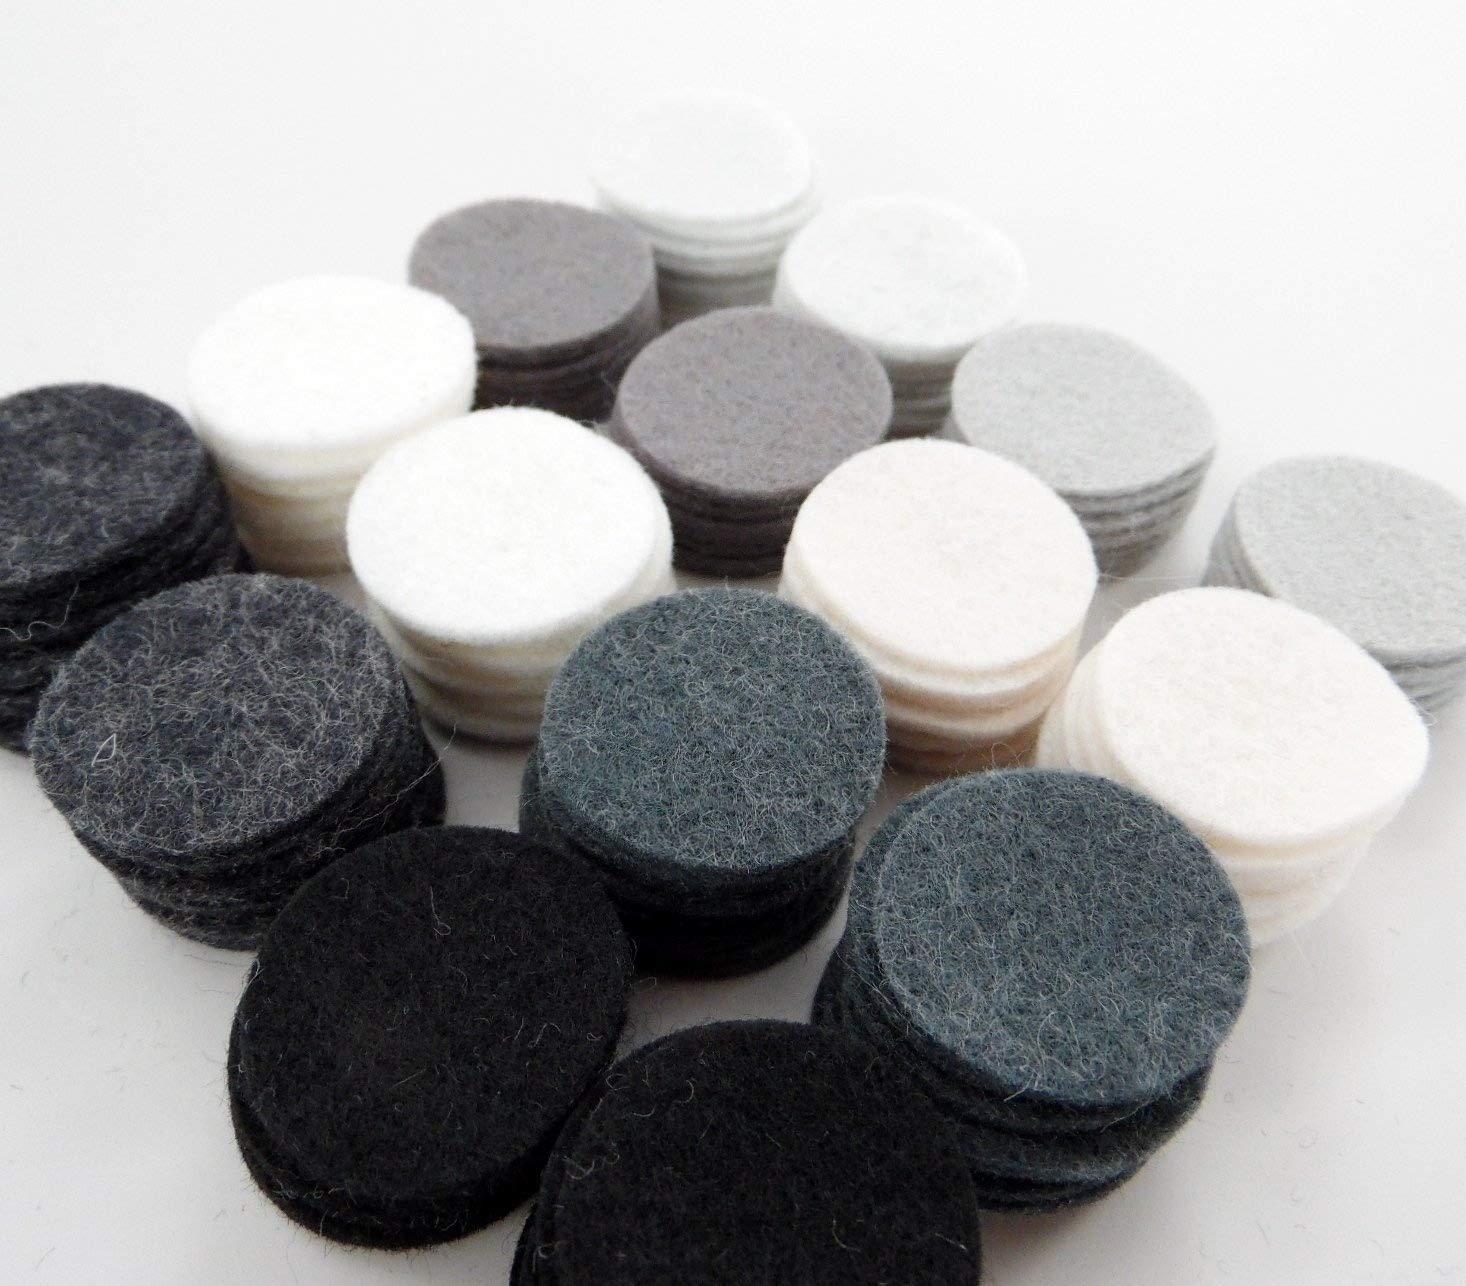 128 Wool Blend Felt 1' Circles - Disco Ball Colors - Made in USA - OTR Felt Over The River Felt